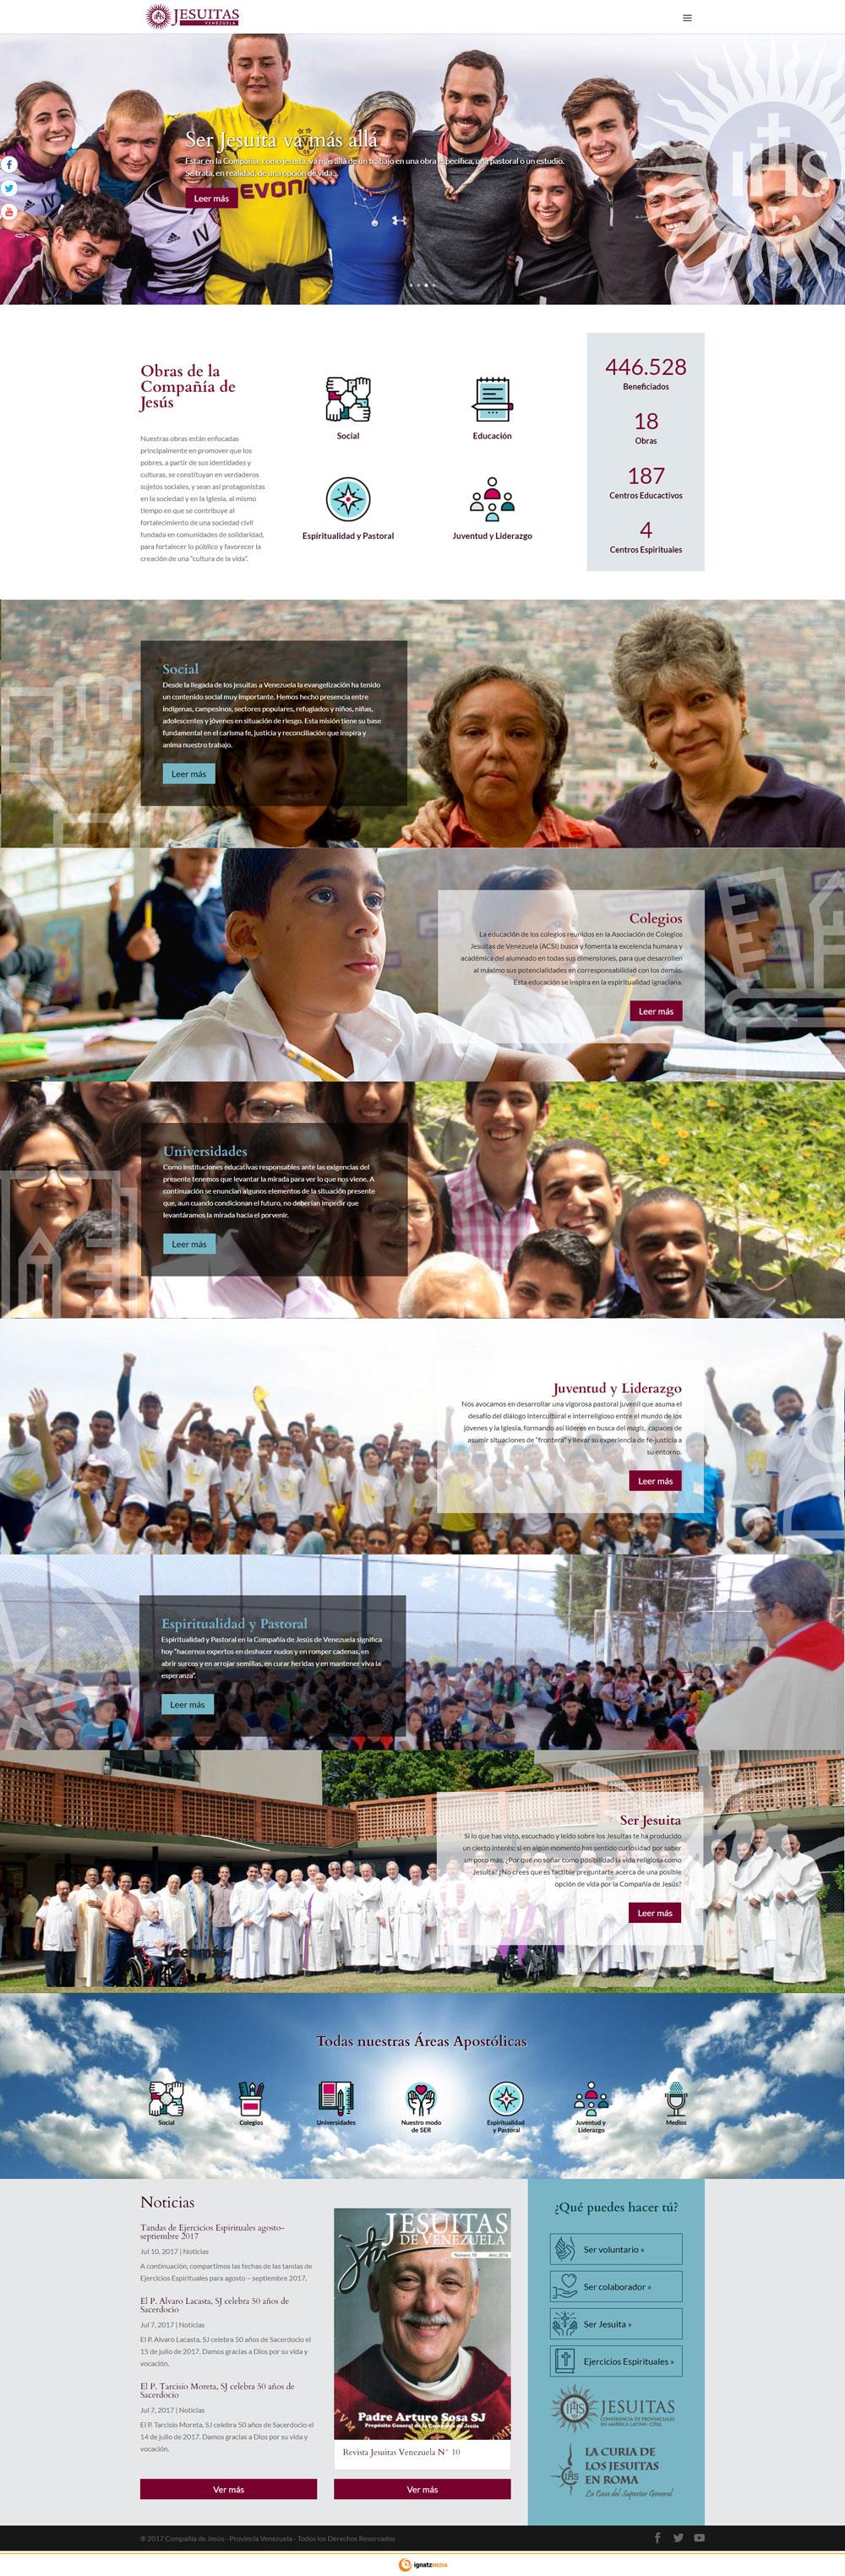 www.jesuitasvenezuela.com